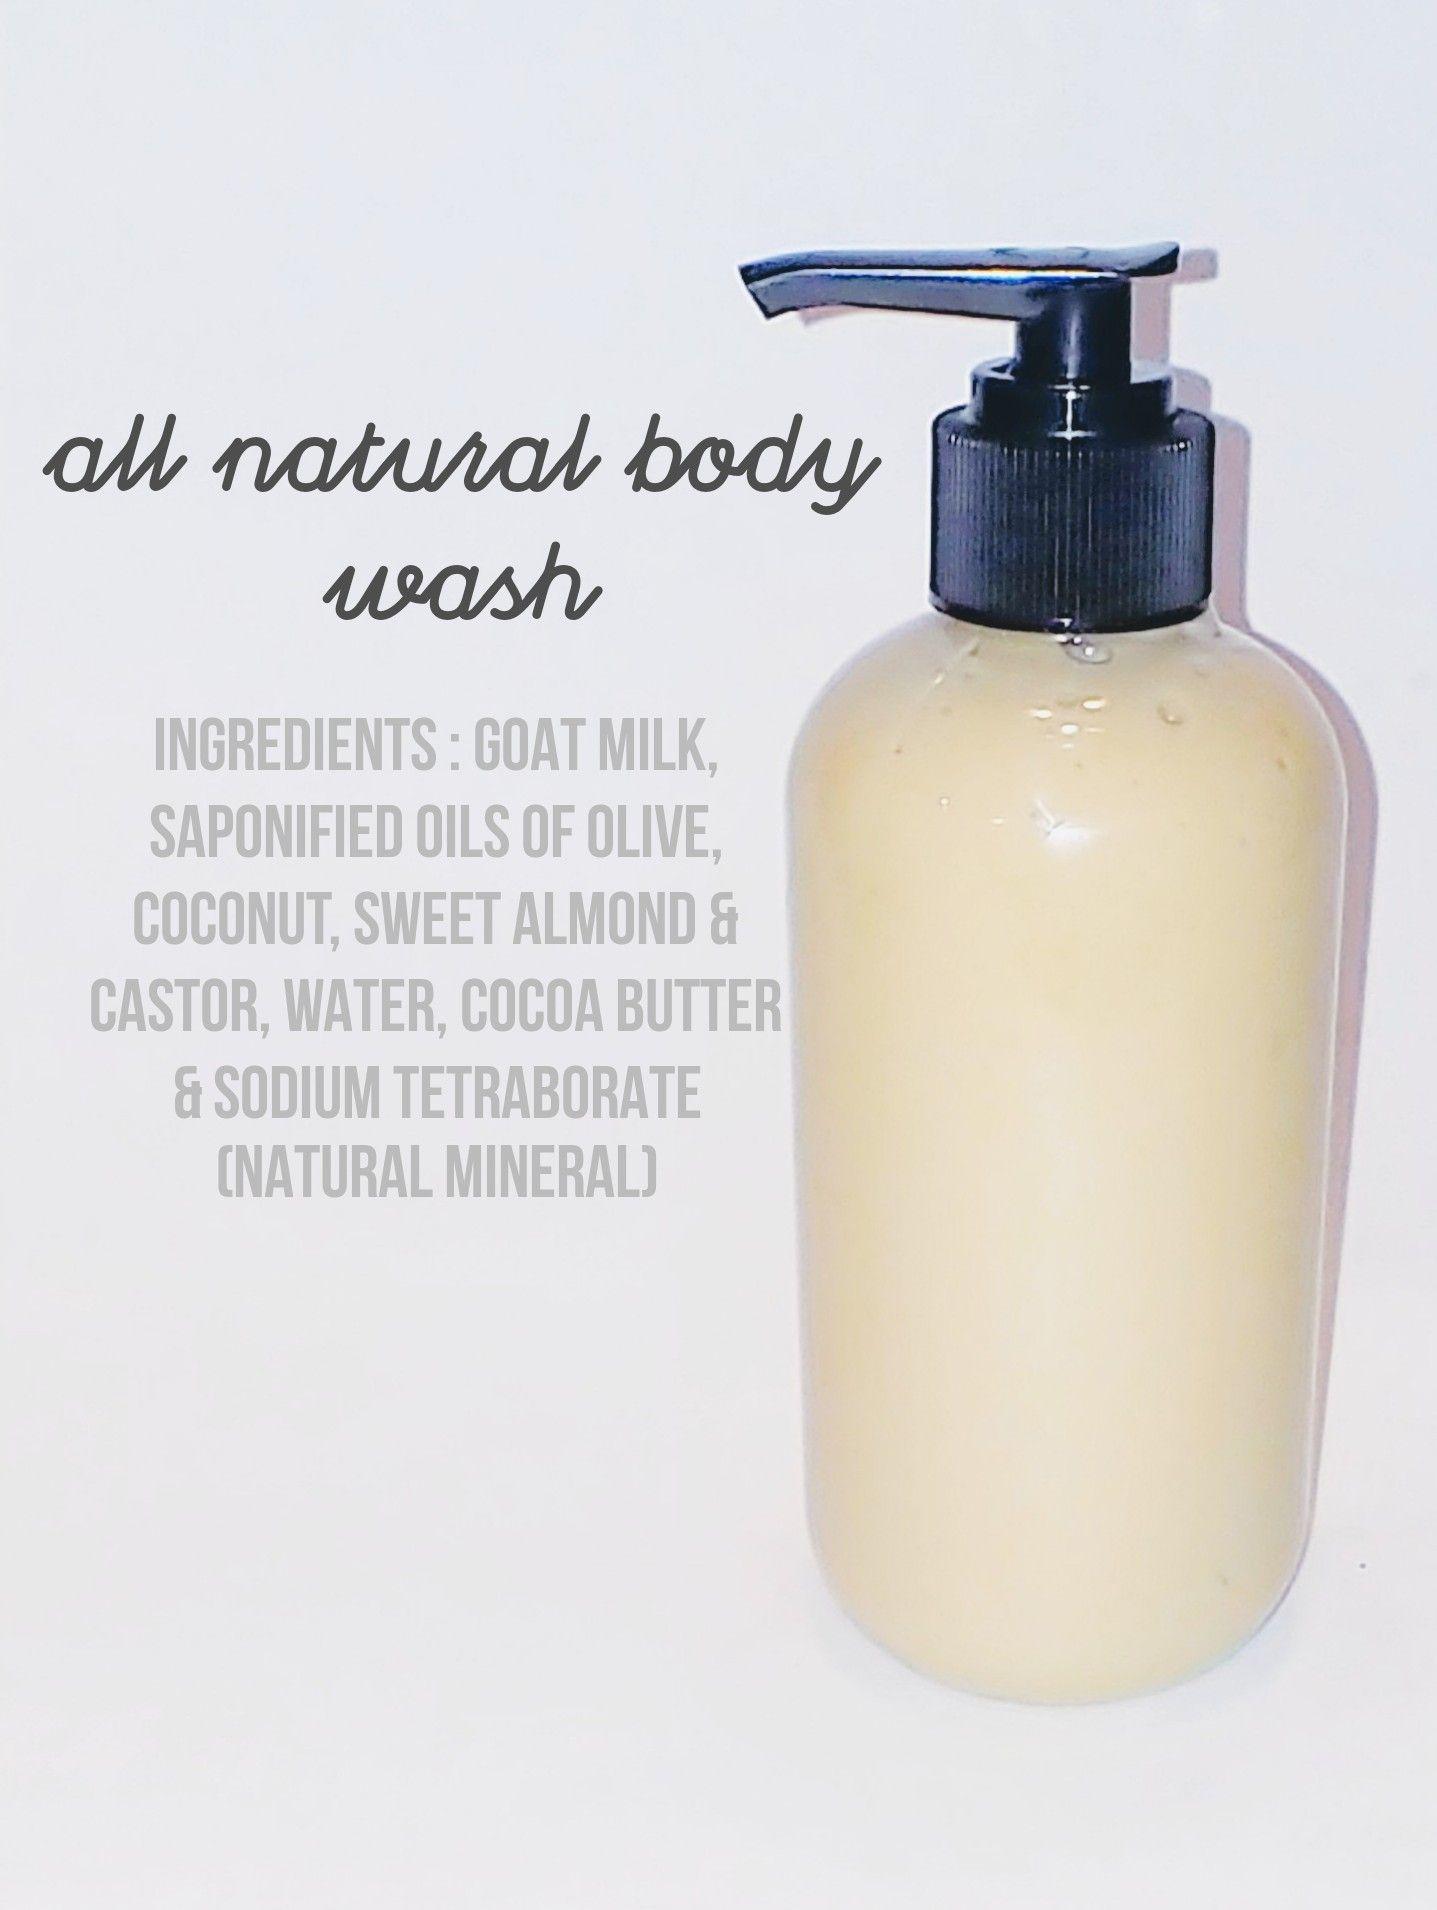 Homemade body wash homemade body wash goats milk lotion